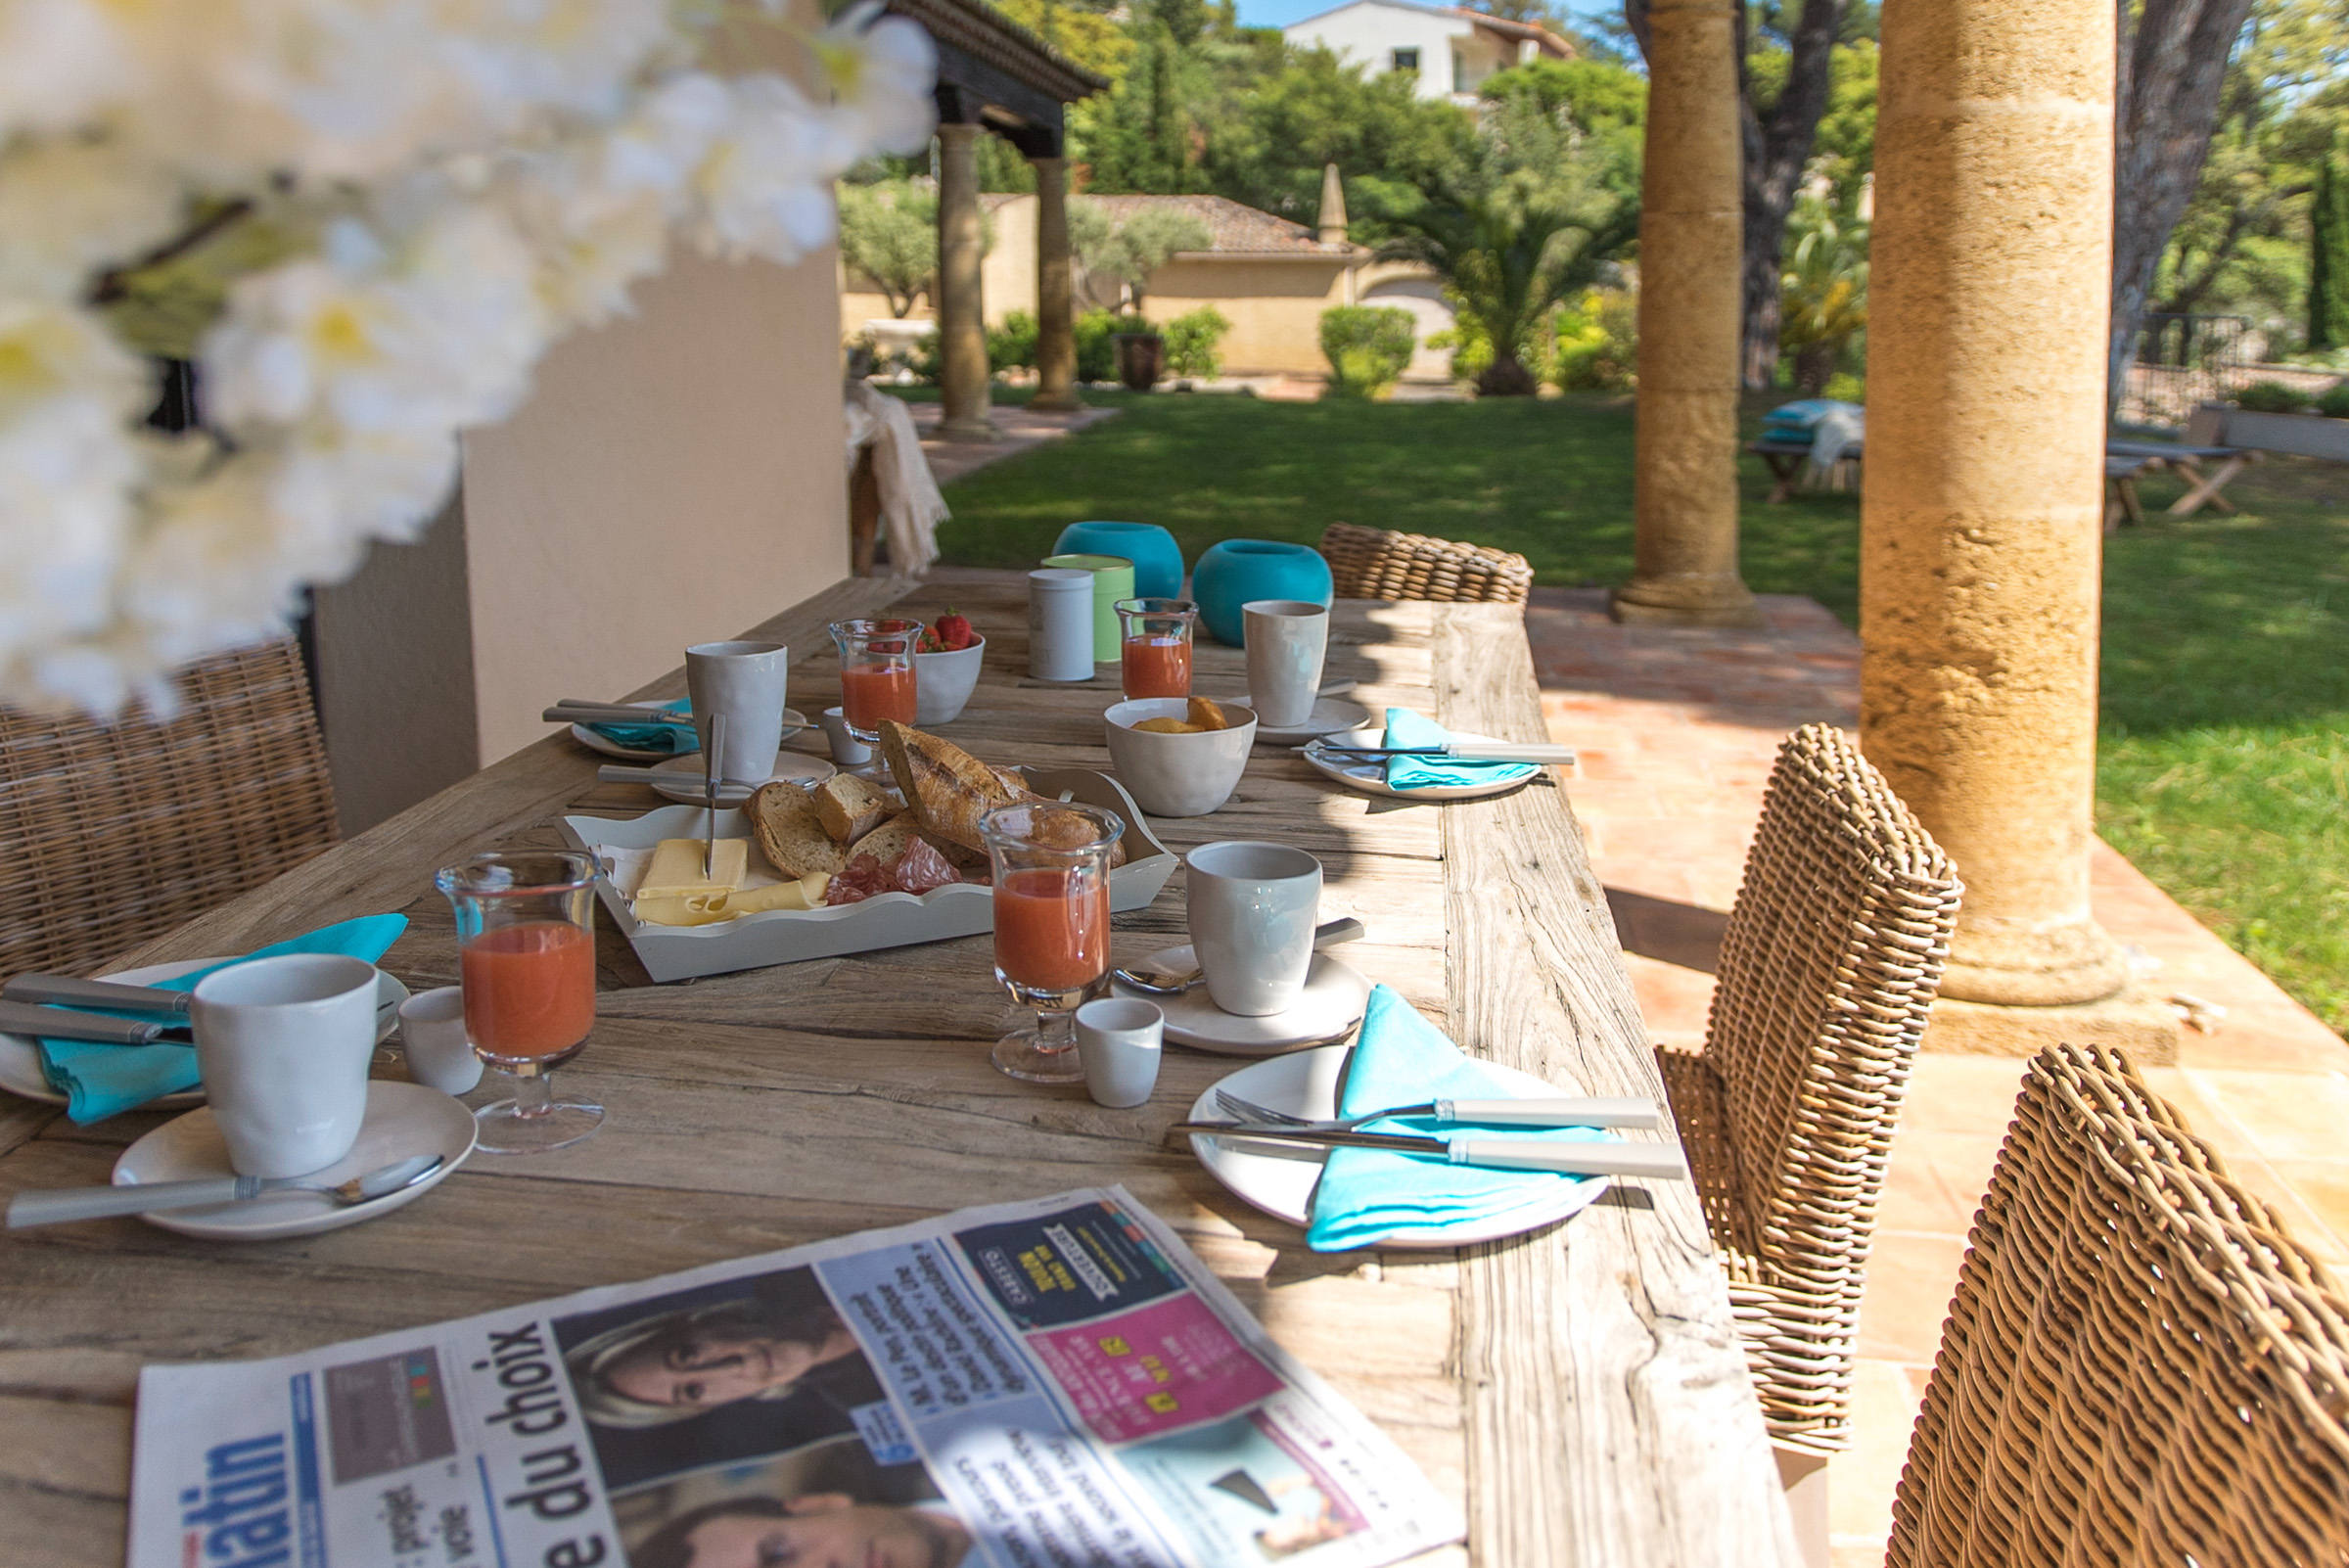 Charming Cote d Azur - Location villa de luxe - Provence / Cote d Azur / Mediterran. - ChicVillas - 15